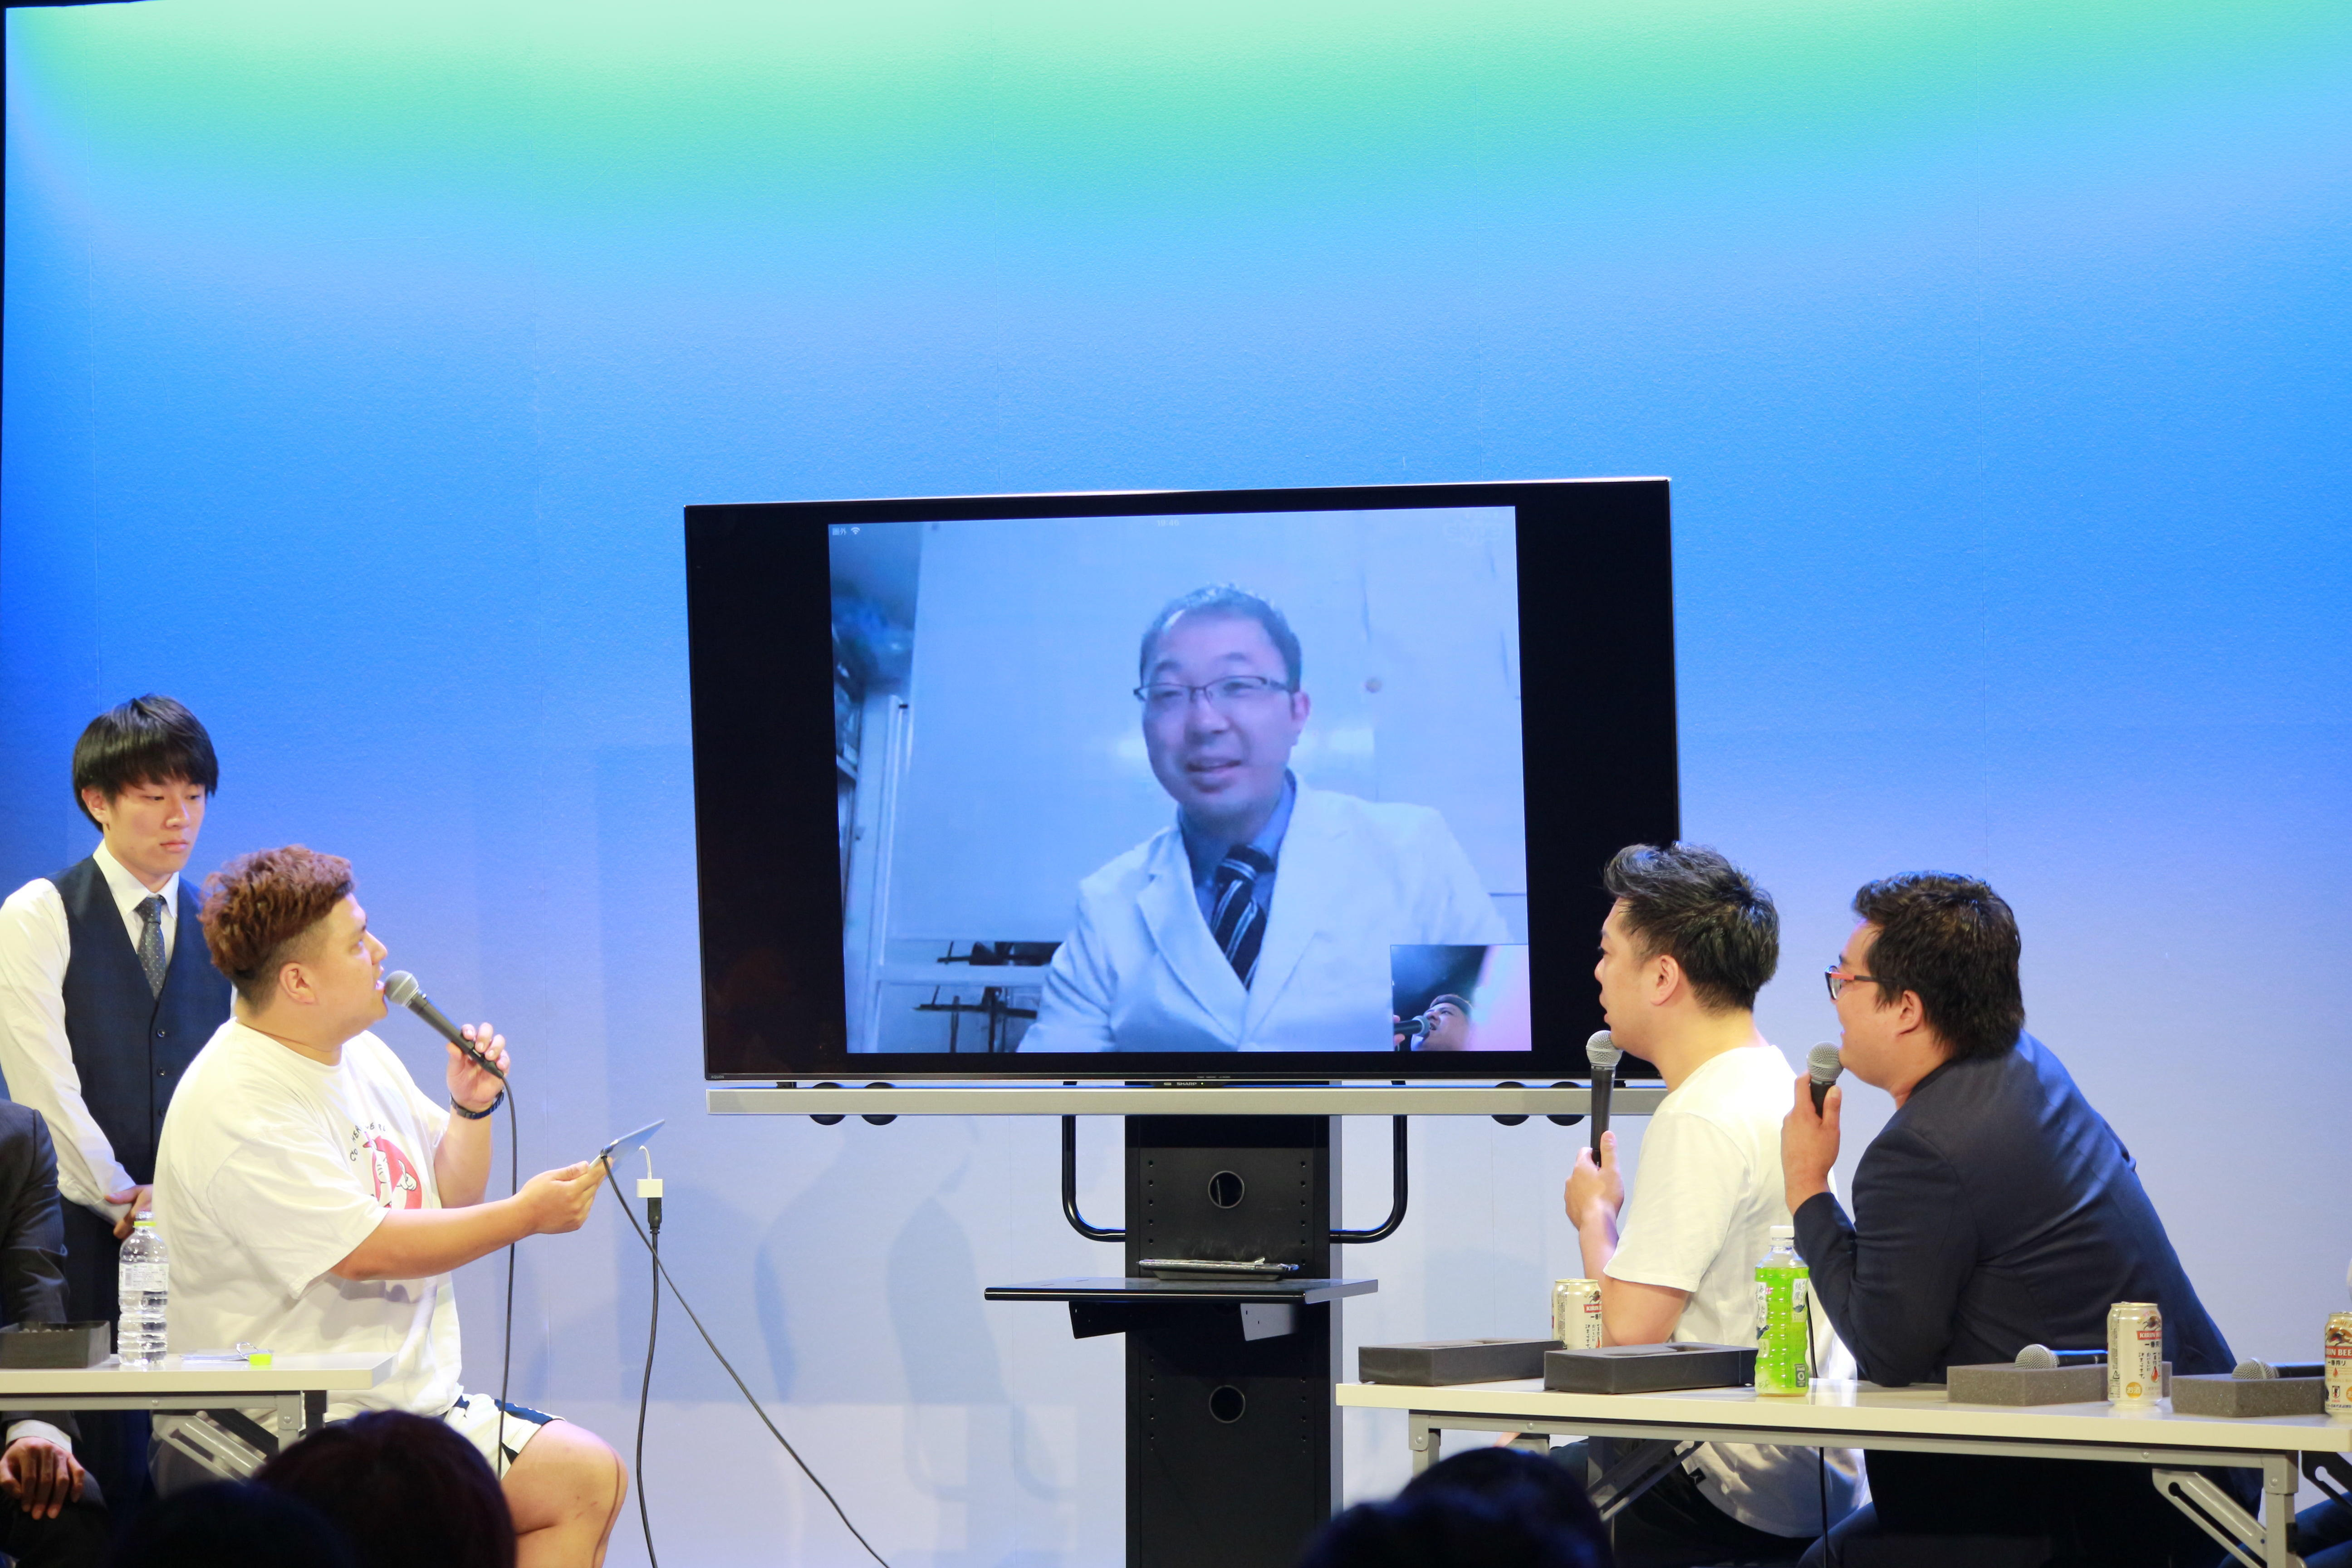 http://news.yoshimoto.co.jp/20180630023823-8cef8be8590ae5afc0312e47715945f240a869c2.jpg